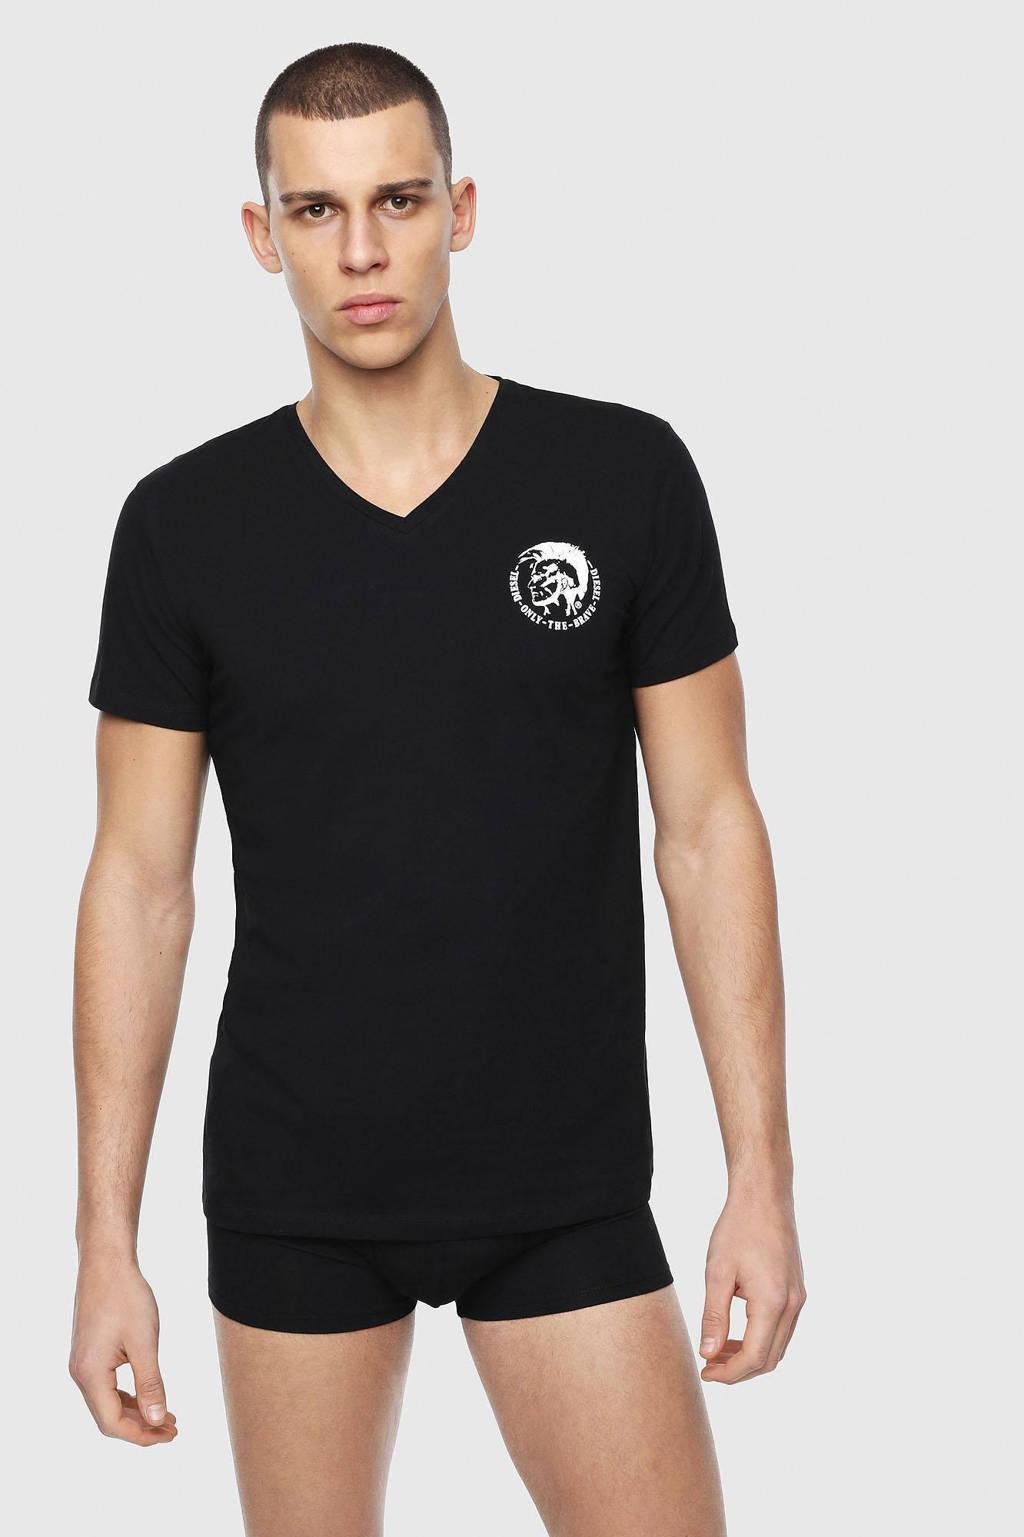 Diesel T-shirt Michael (set van 3) zwart, Zwart